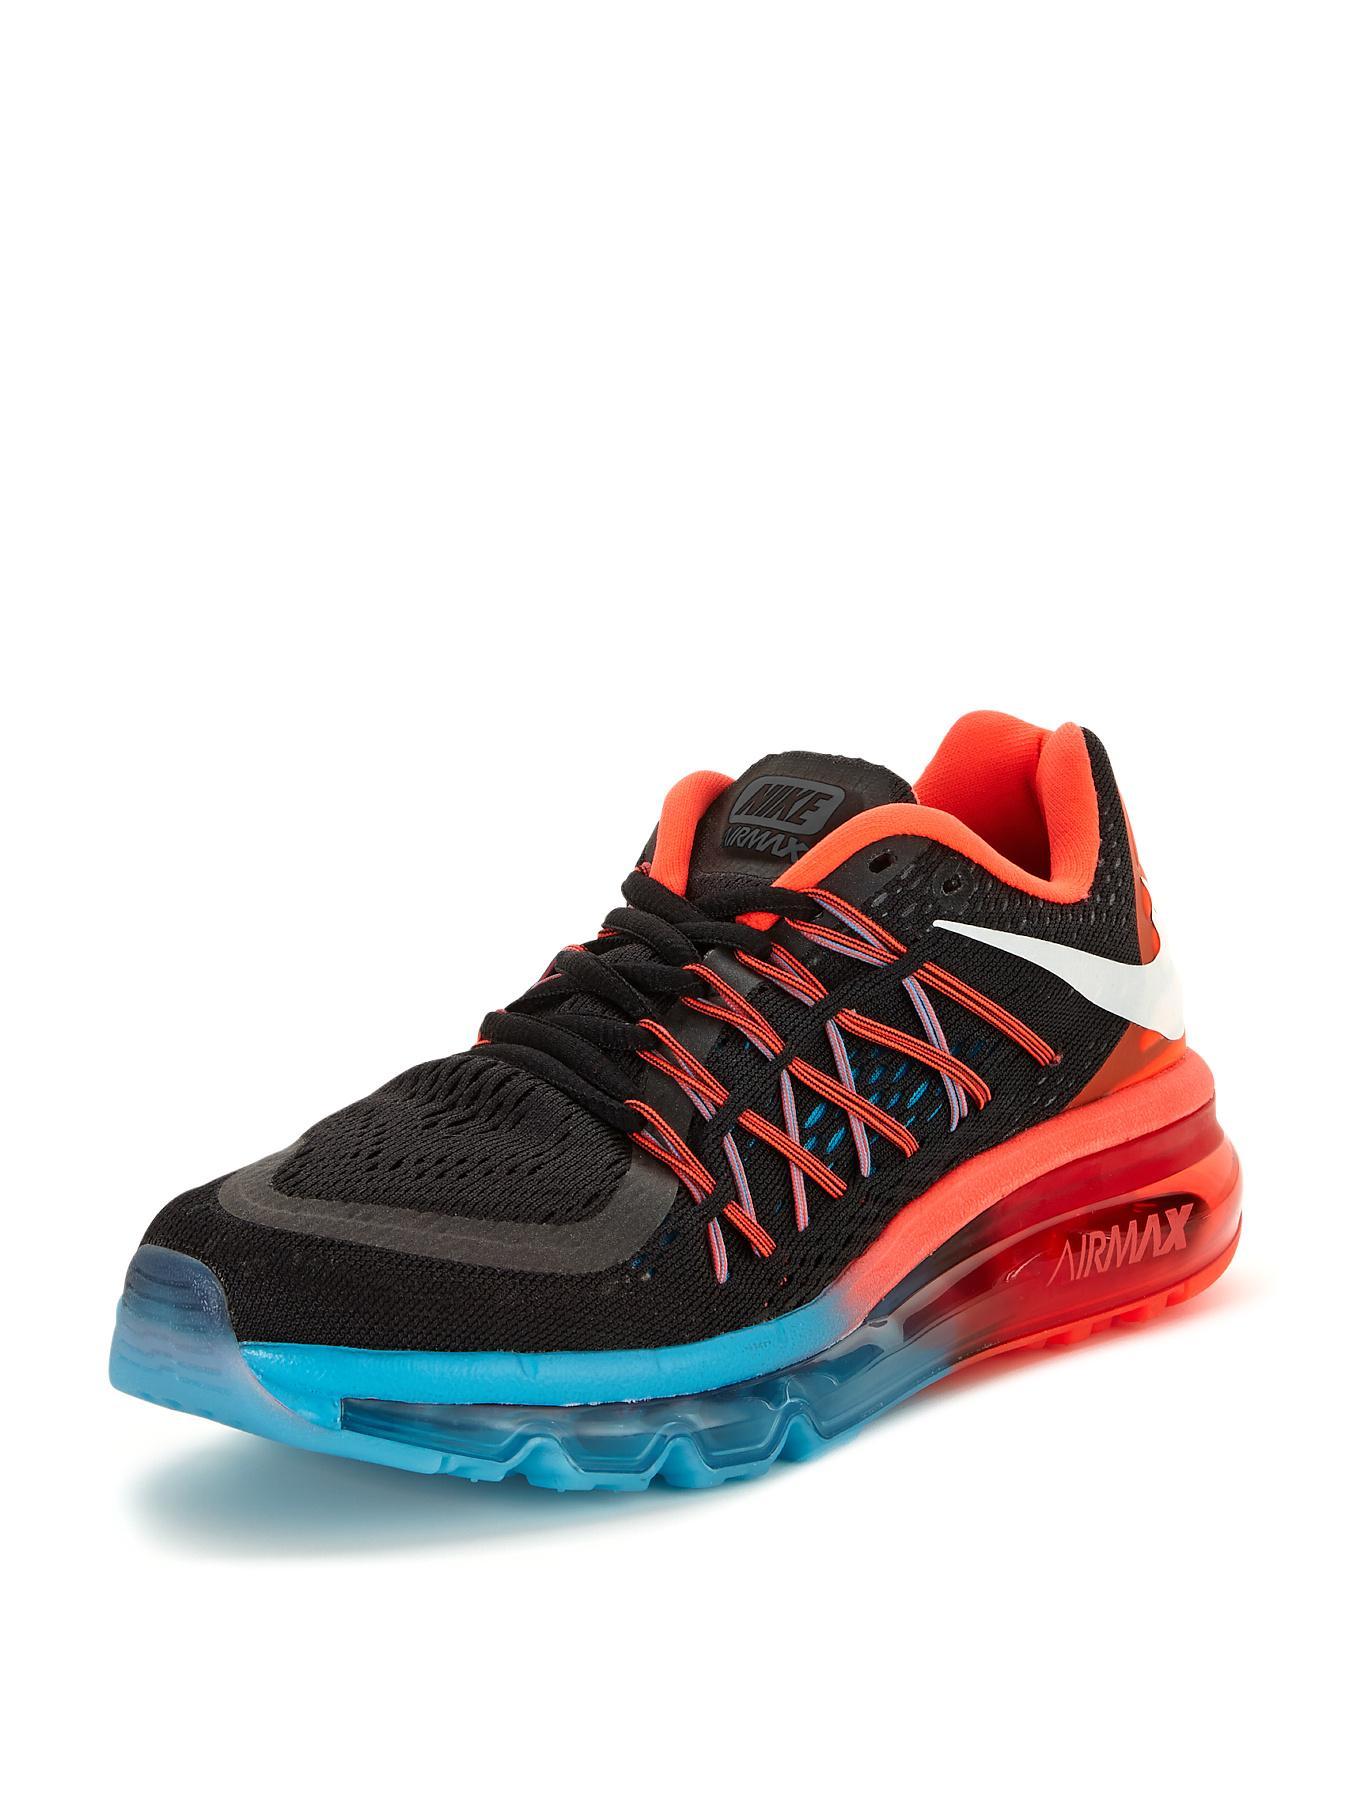 Nike Air Max 2015 Junior Trainers - Black, Black